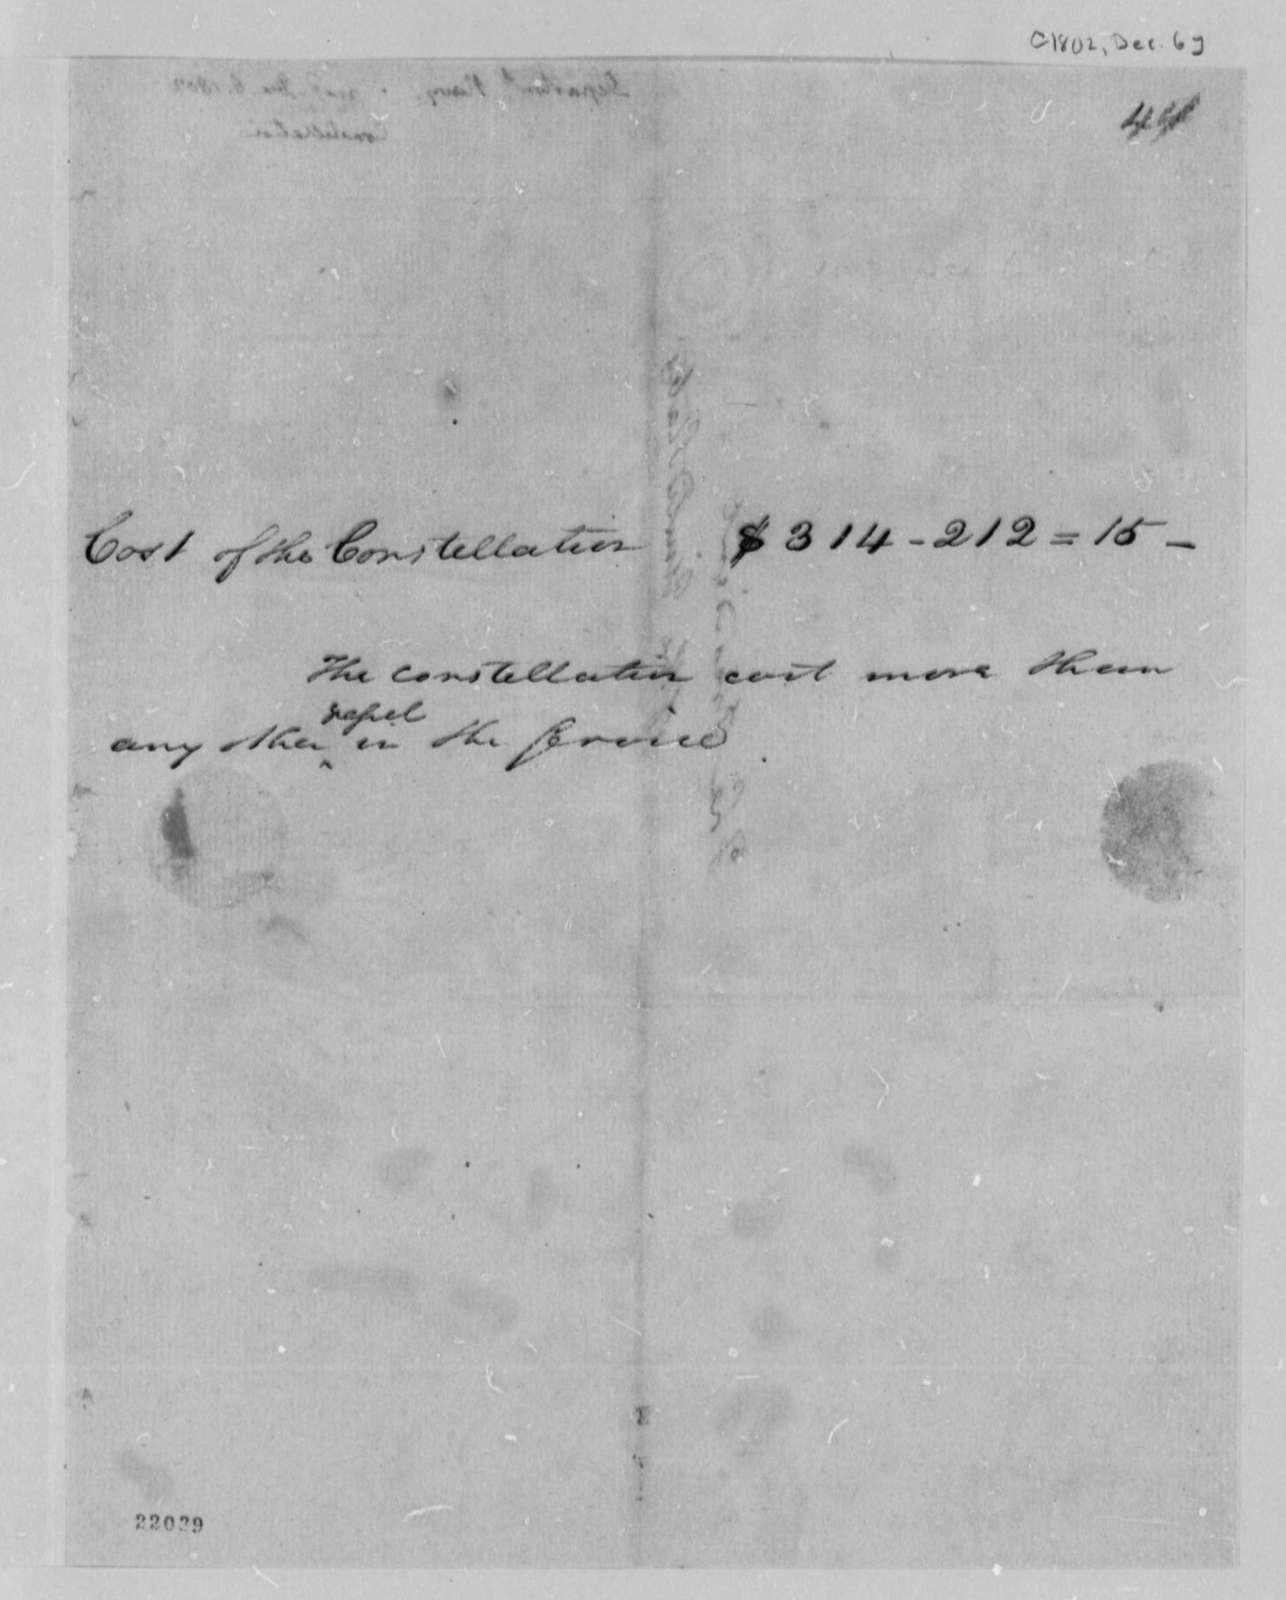 Robert Smith to Thomas Jefferson, December 6, 1802, Cost of Constellation